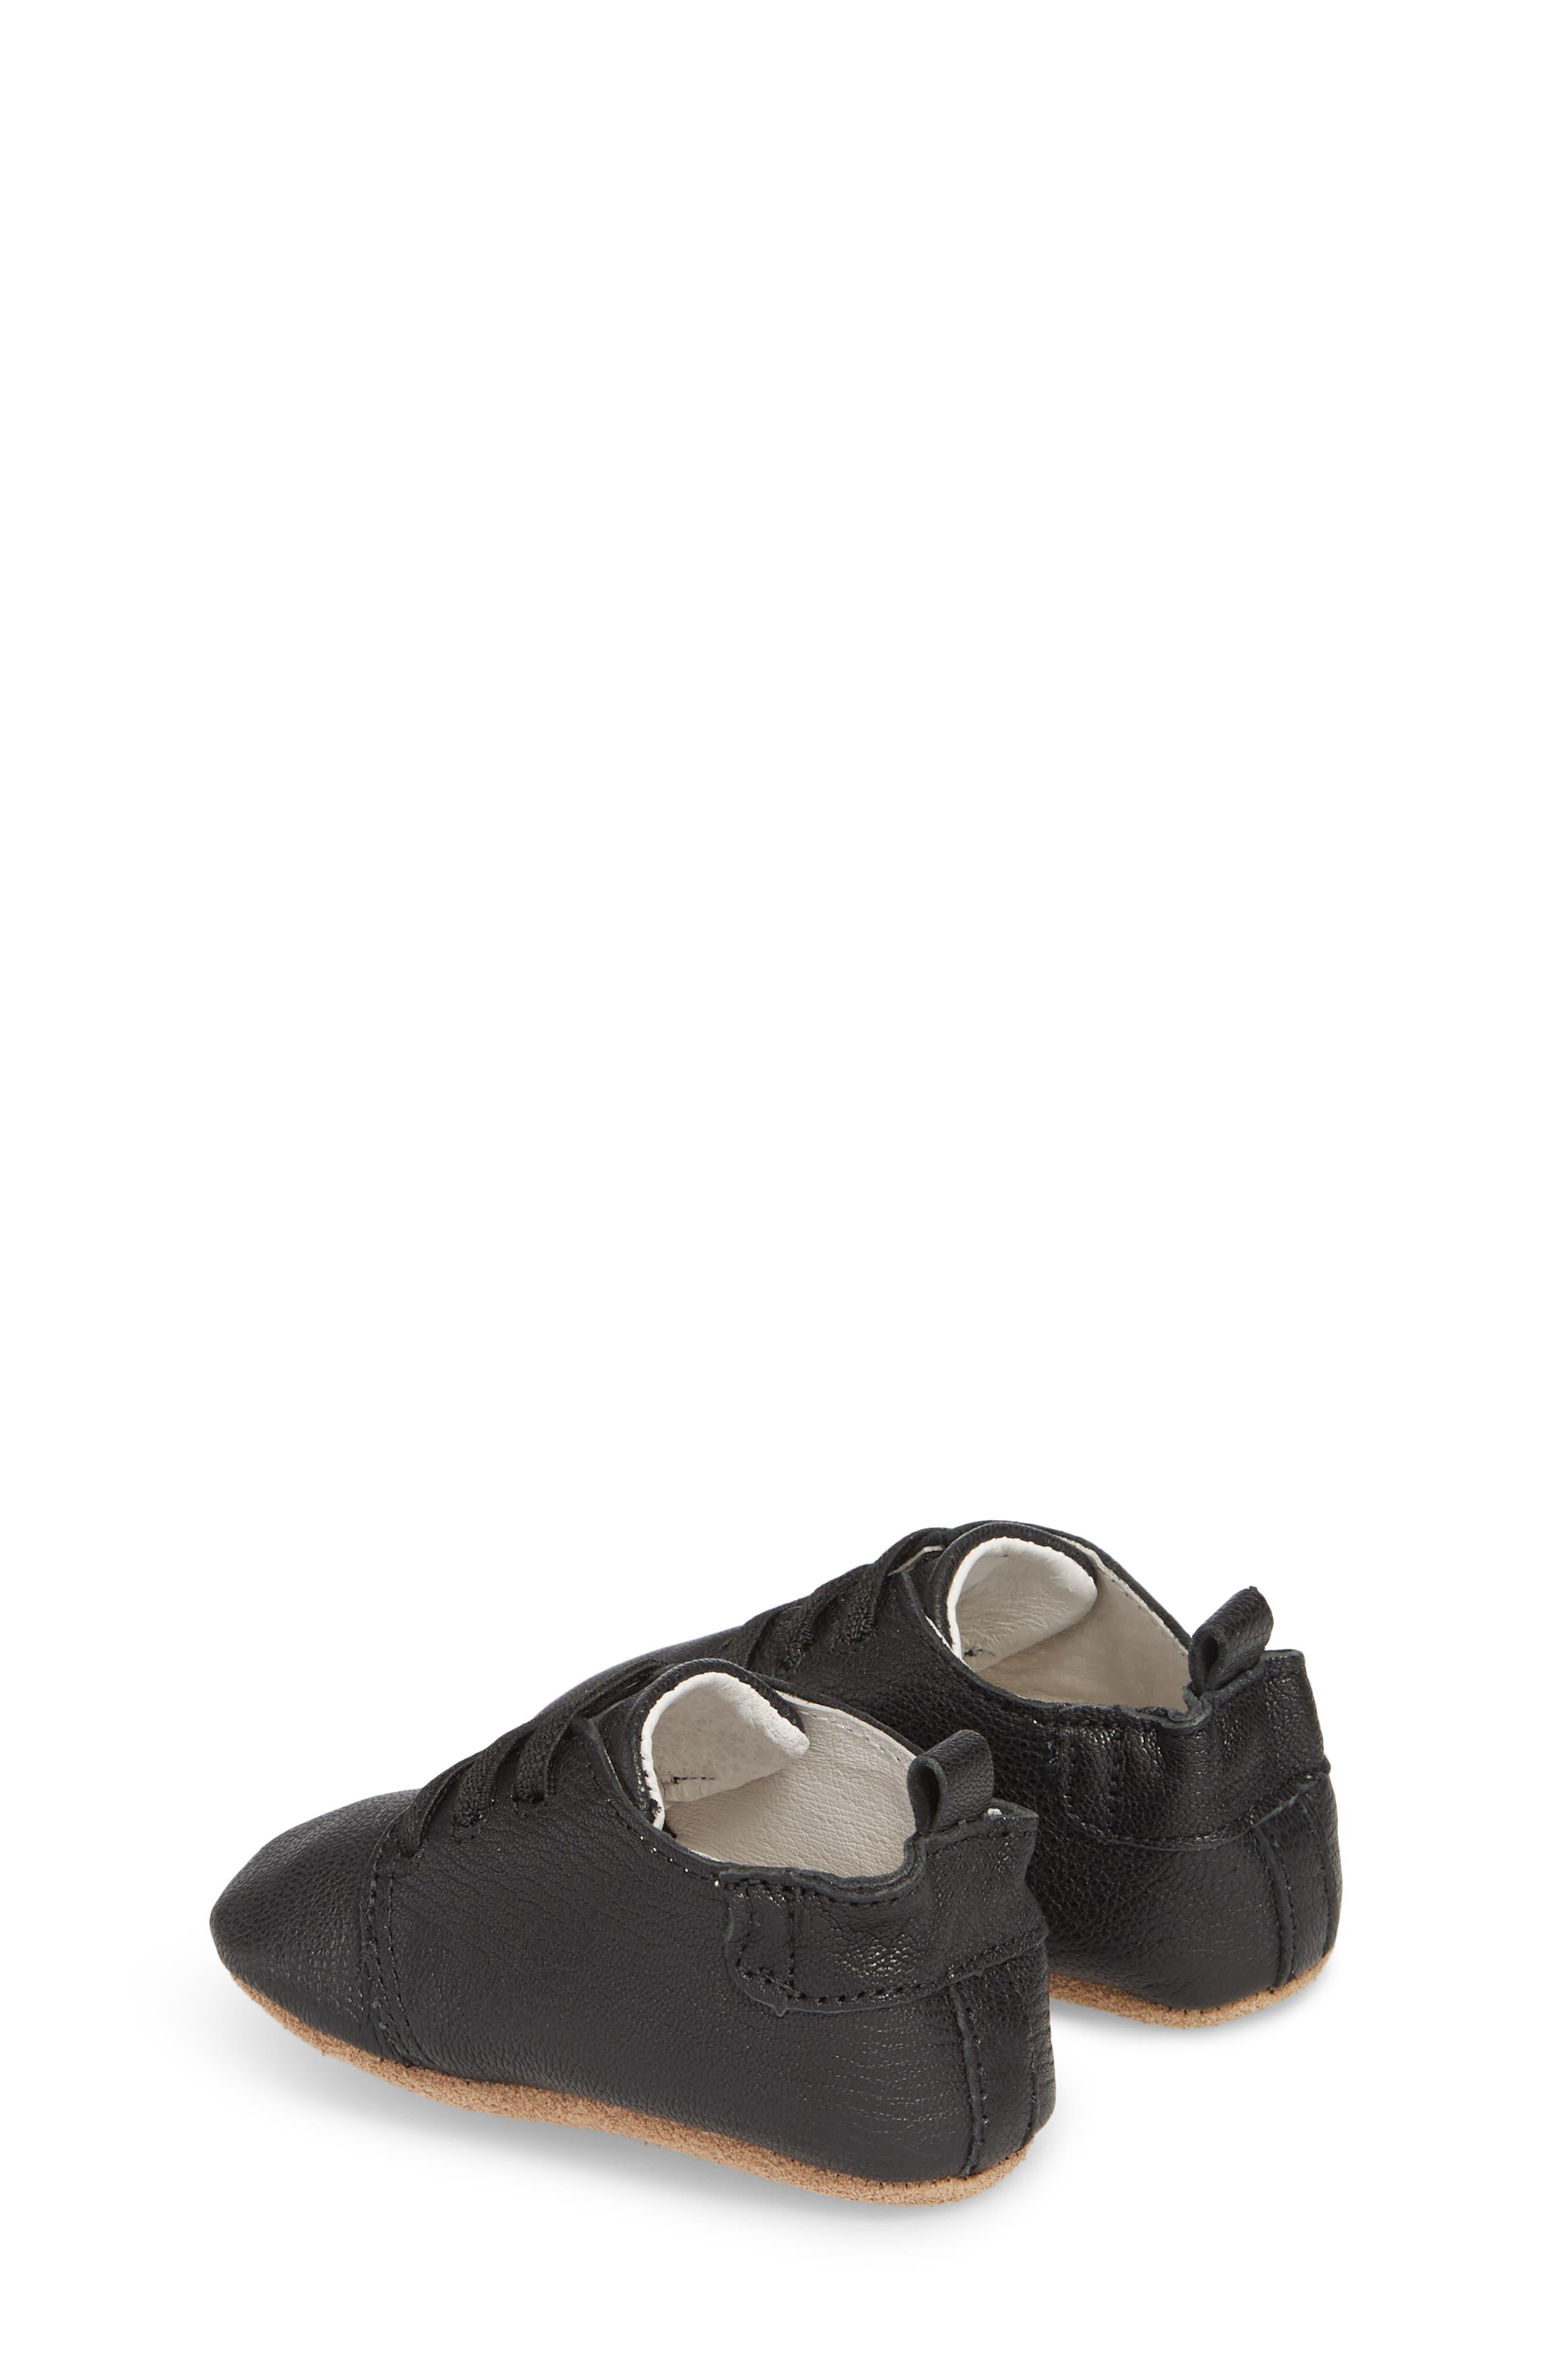 Owen Oxford Crib Shoe,                             Alternate thumbnail 2, color,                             BLACK